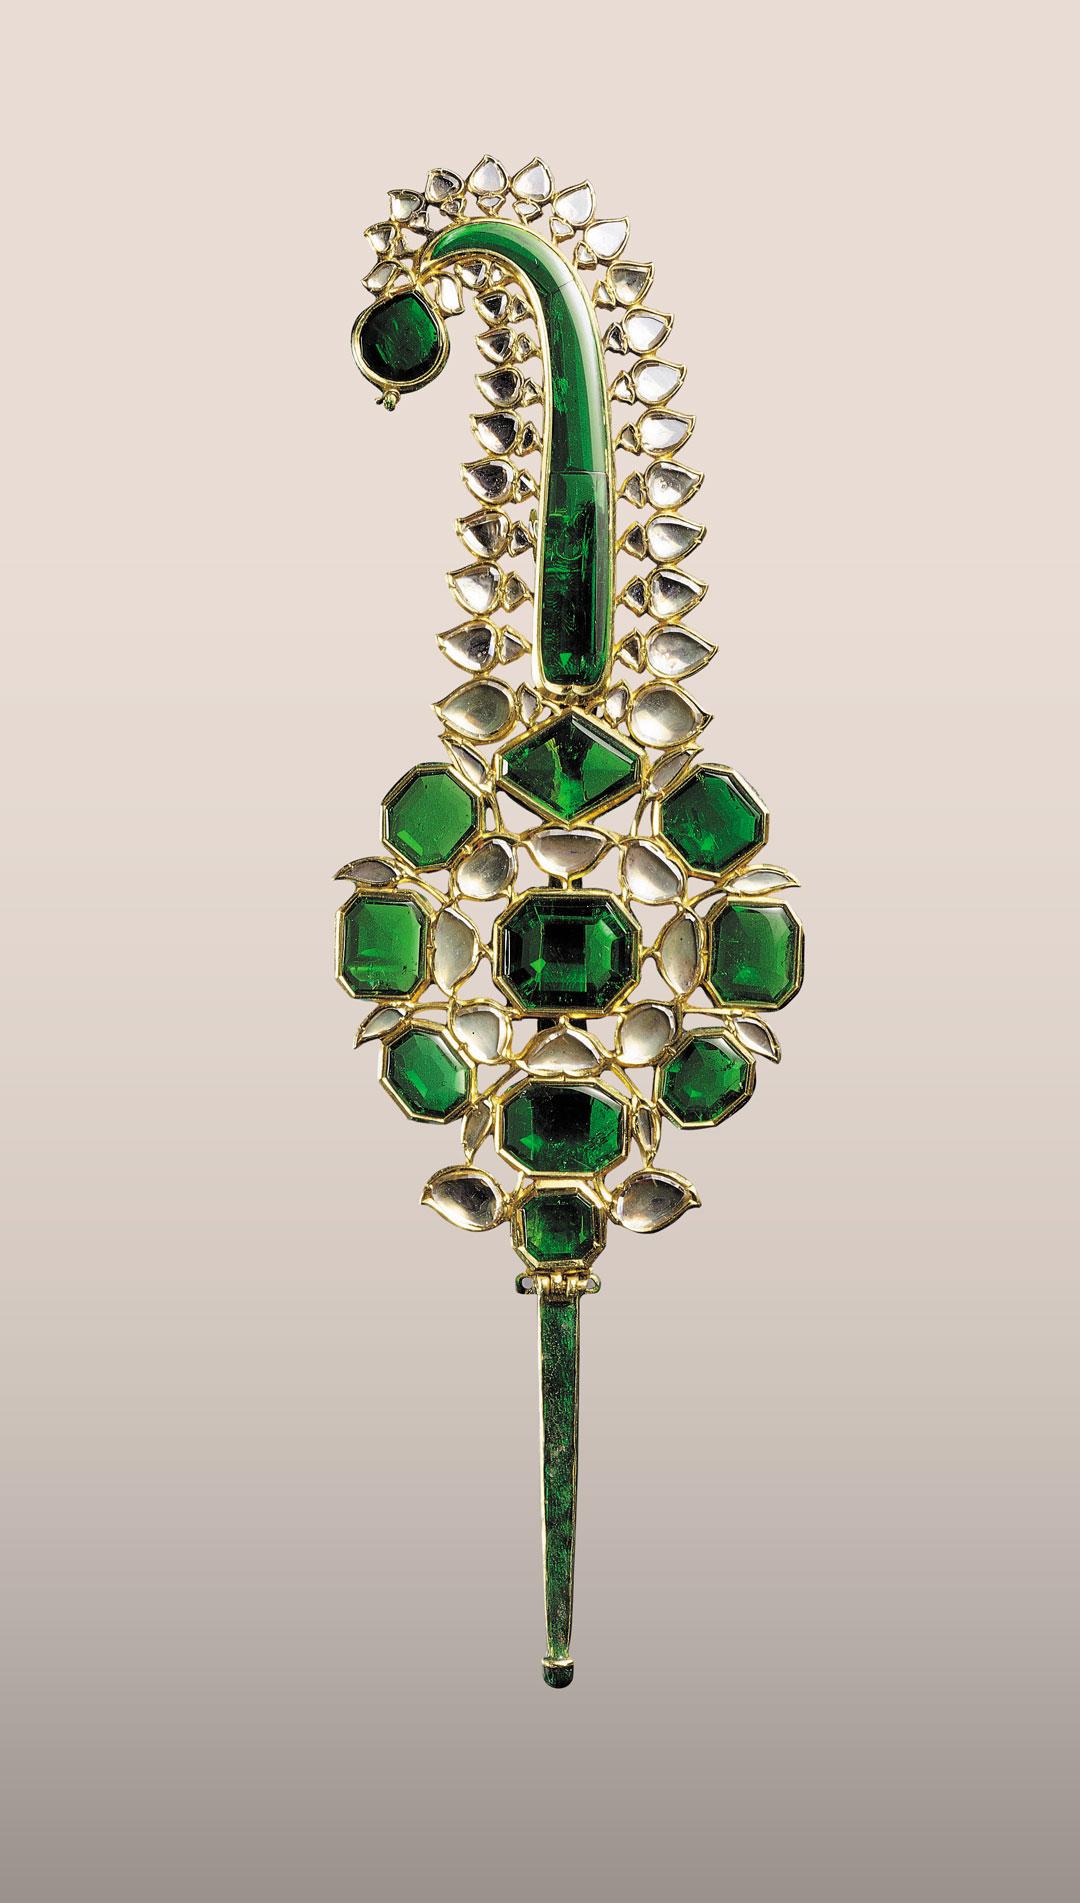 Sarpech (Turban Ornament), Probably second half of 17th century